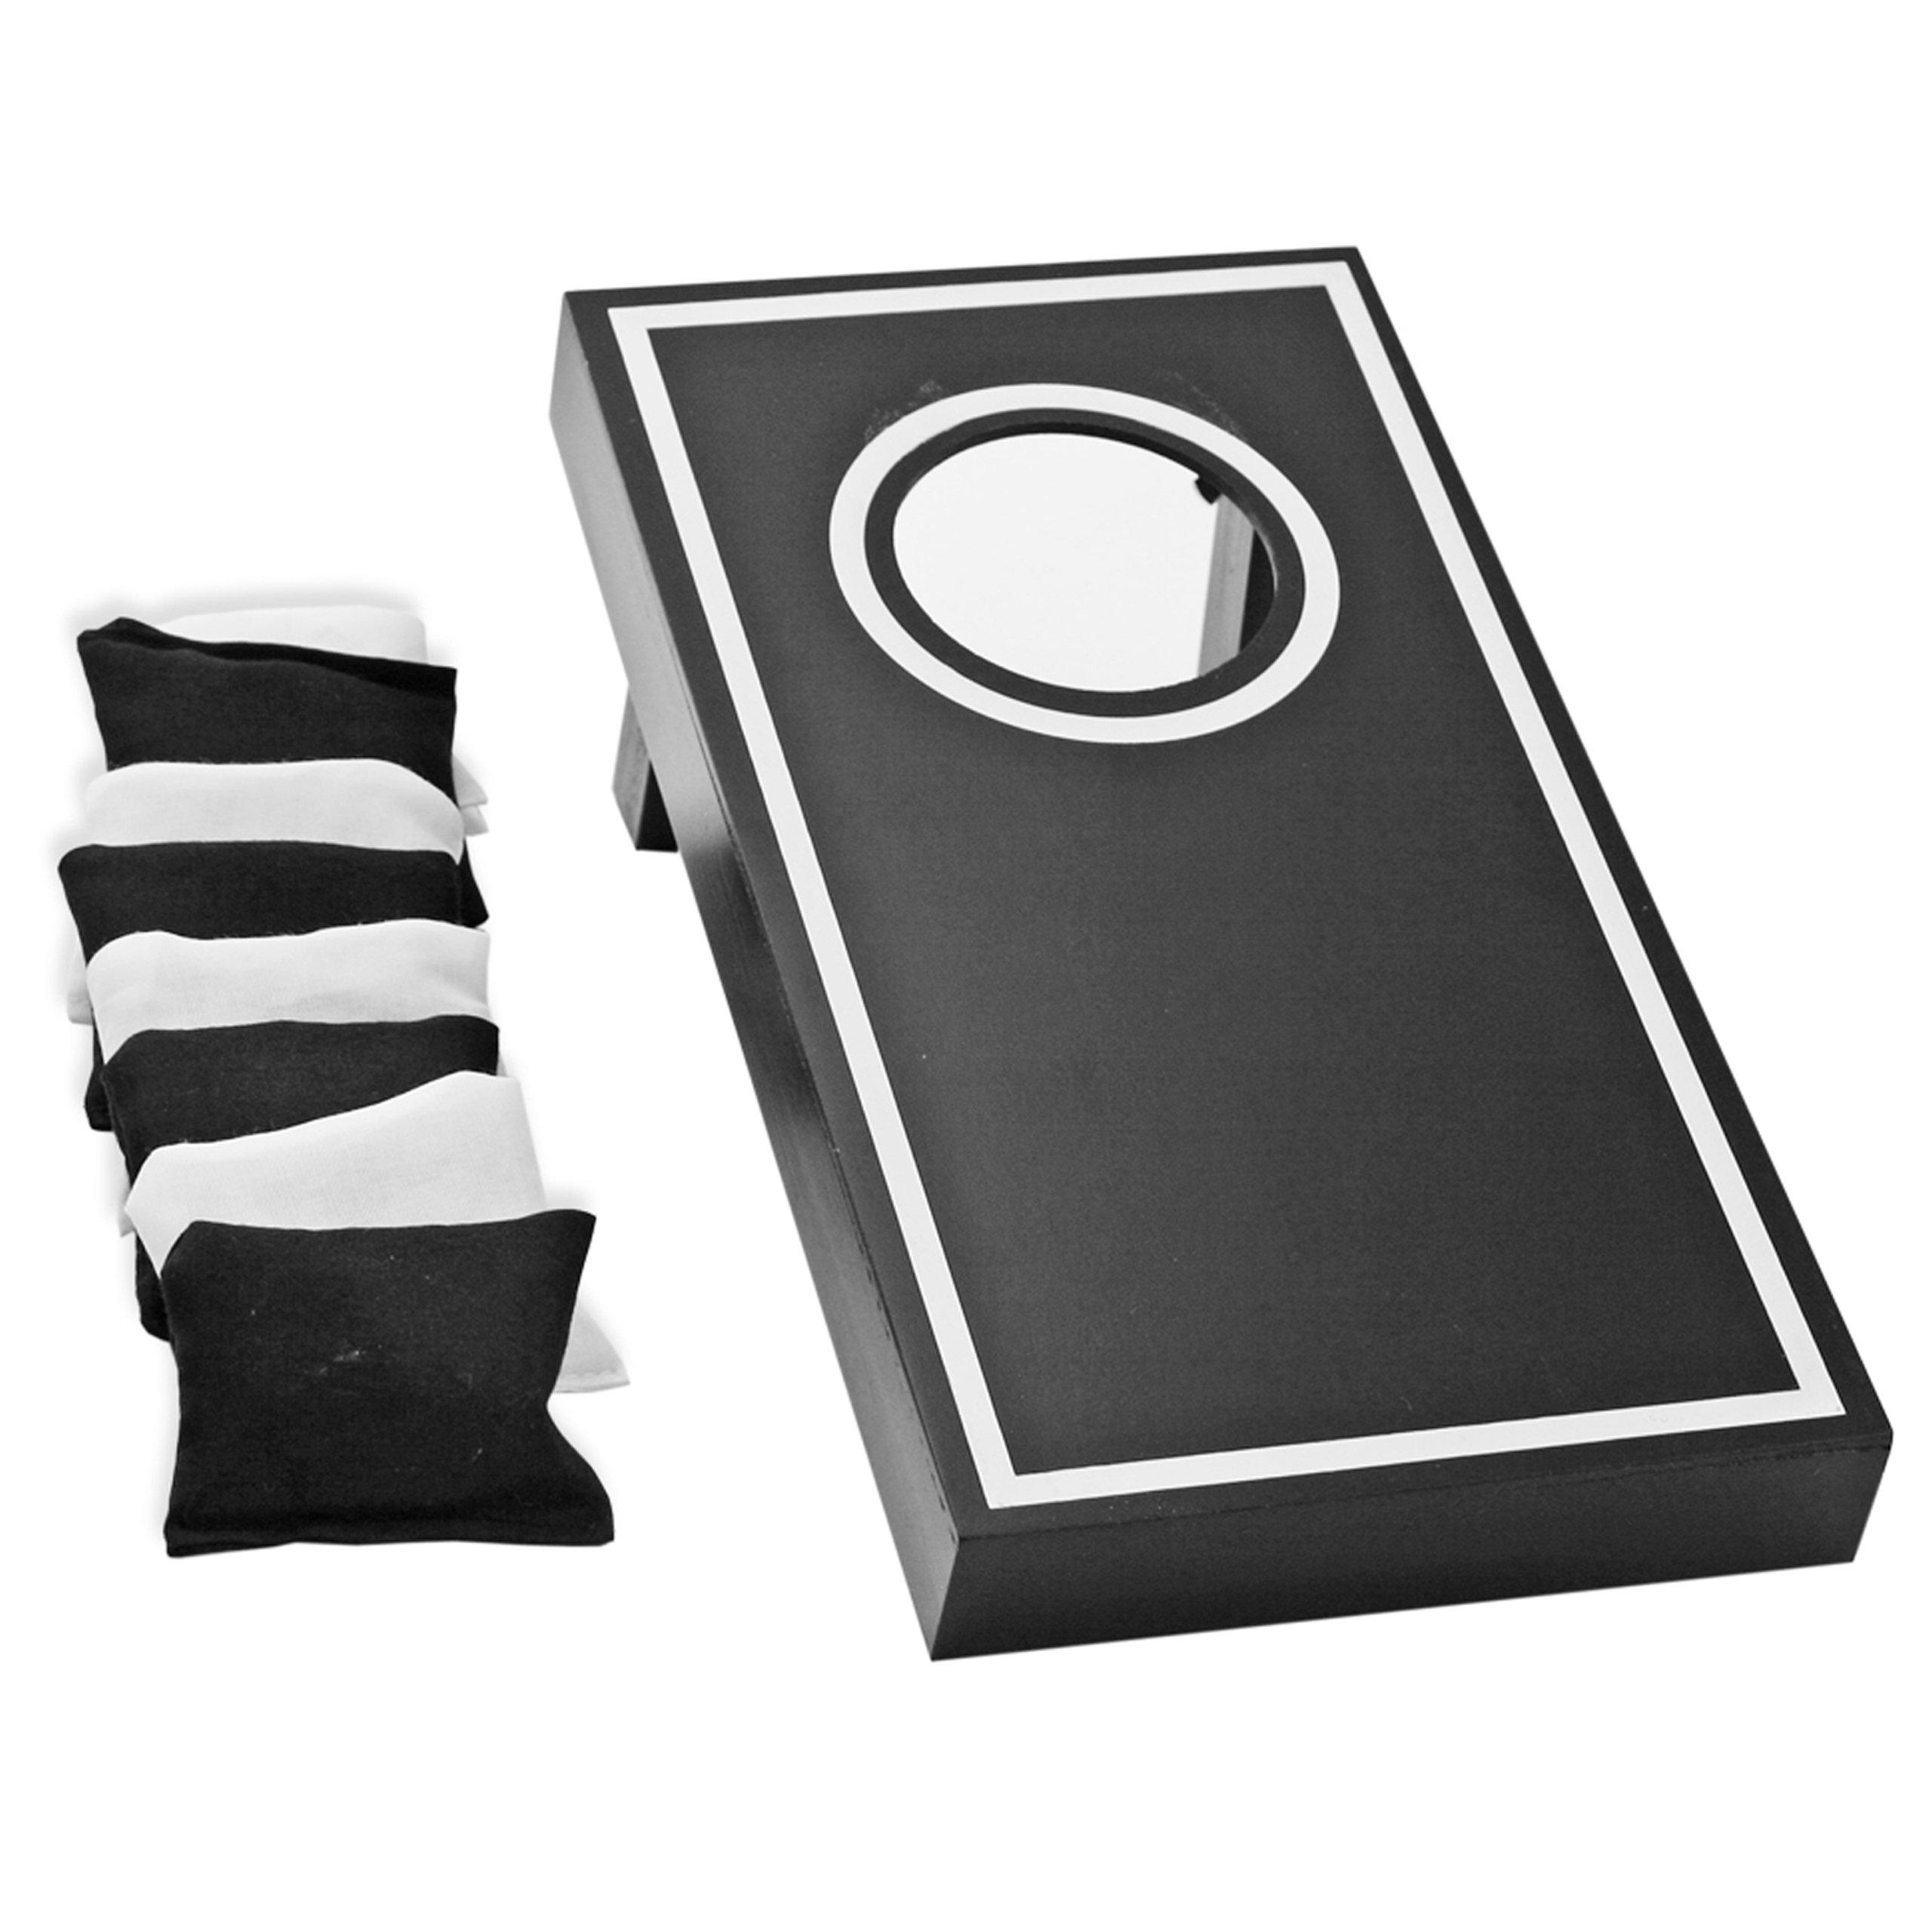 Natico Originals Office or Home Executive Mini Toss Corn Hole Game (60-G072)